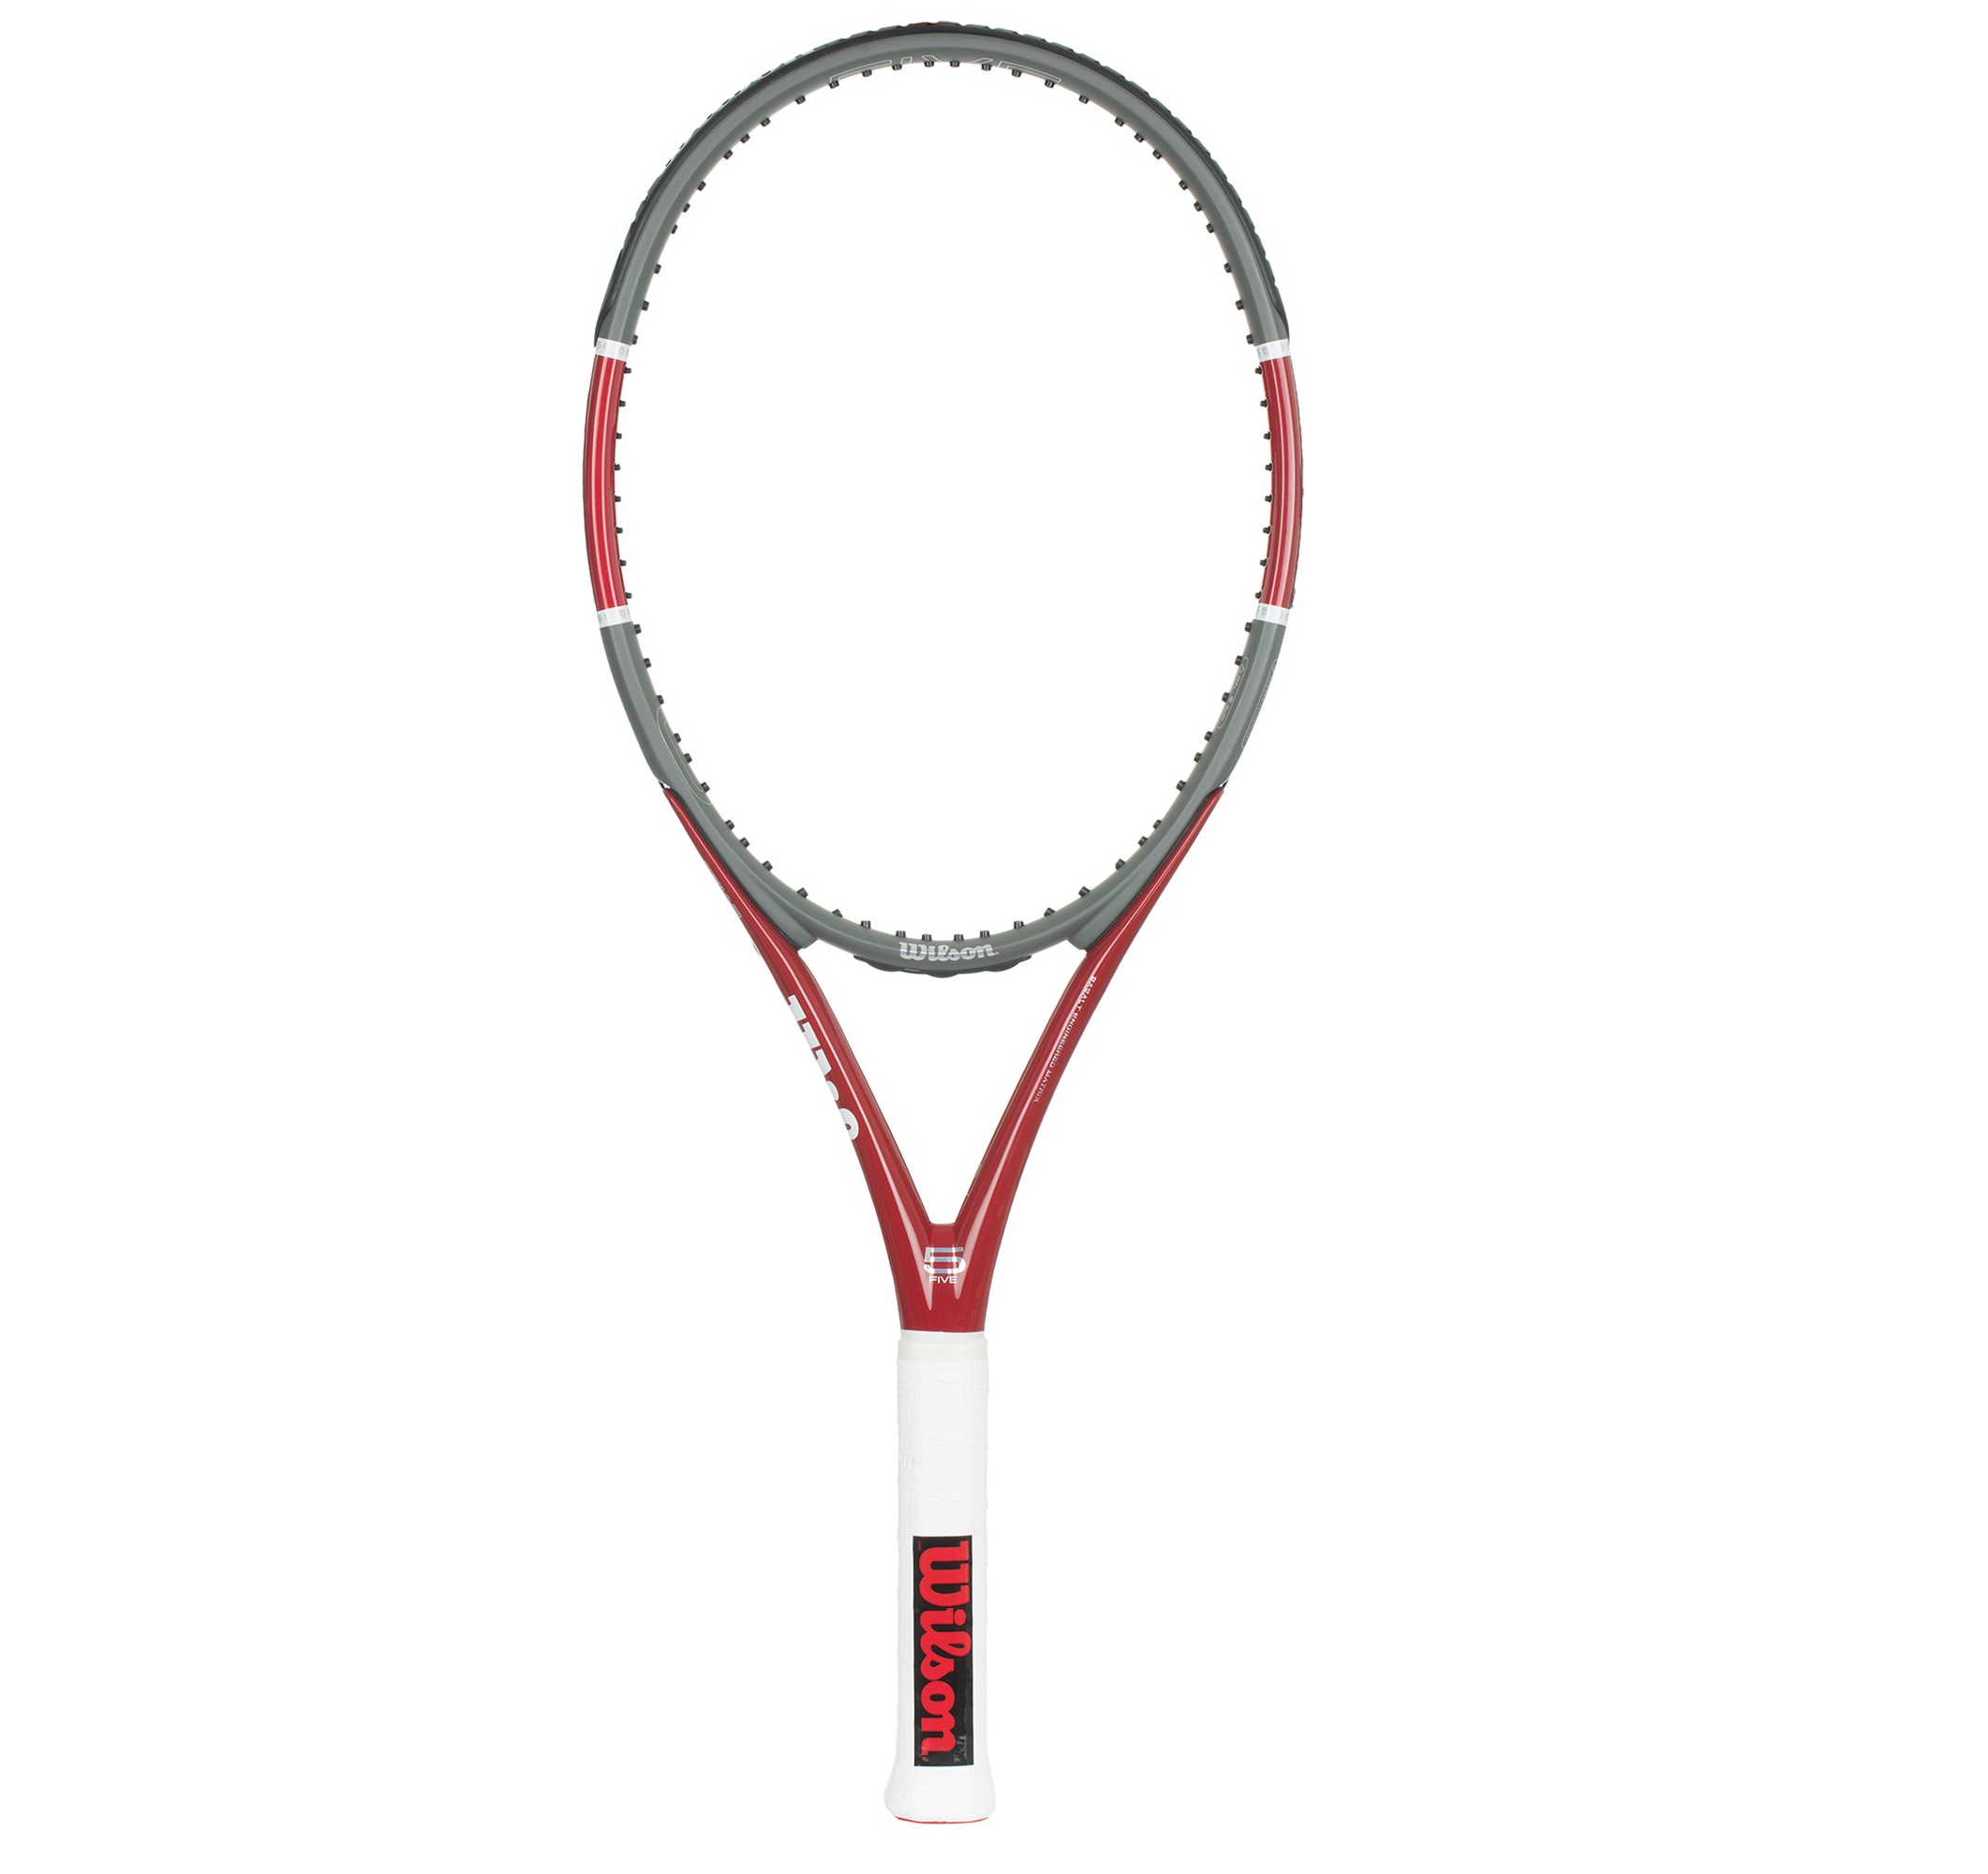 Wilson Ракетка для большого тенниса Wilson Triad Five, размер 3 wilson набор мячей для большого тенниса wilson australian open 3 ball can размер без размера